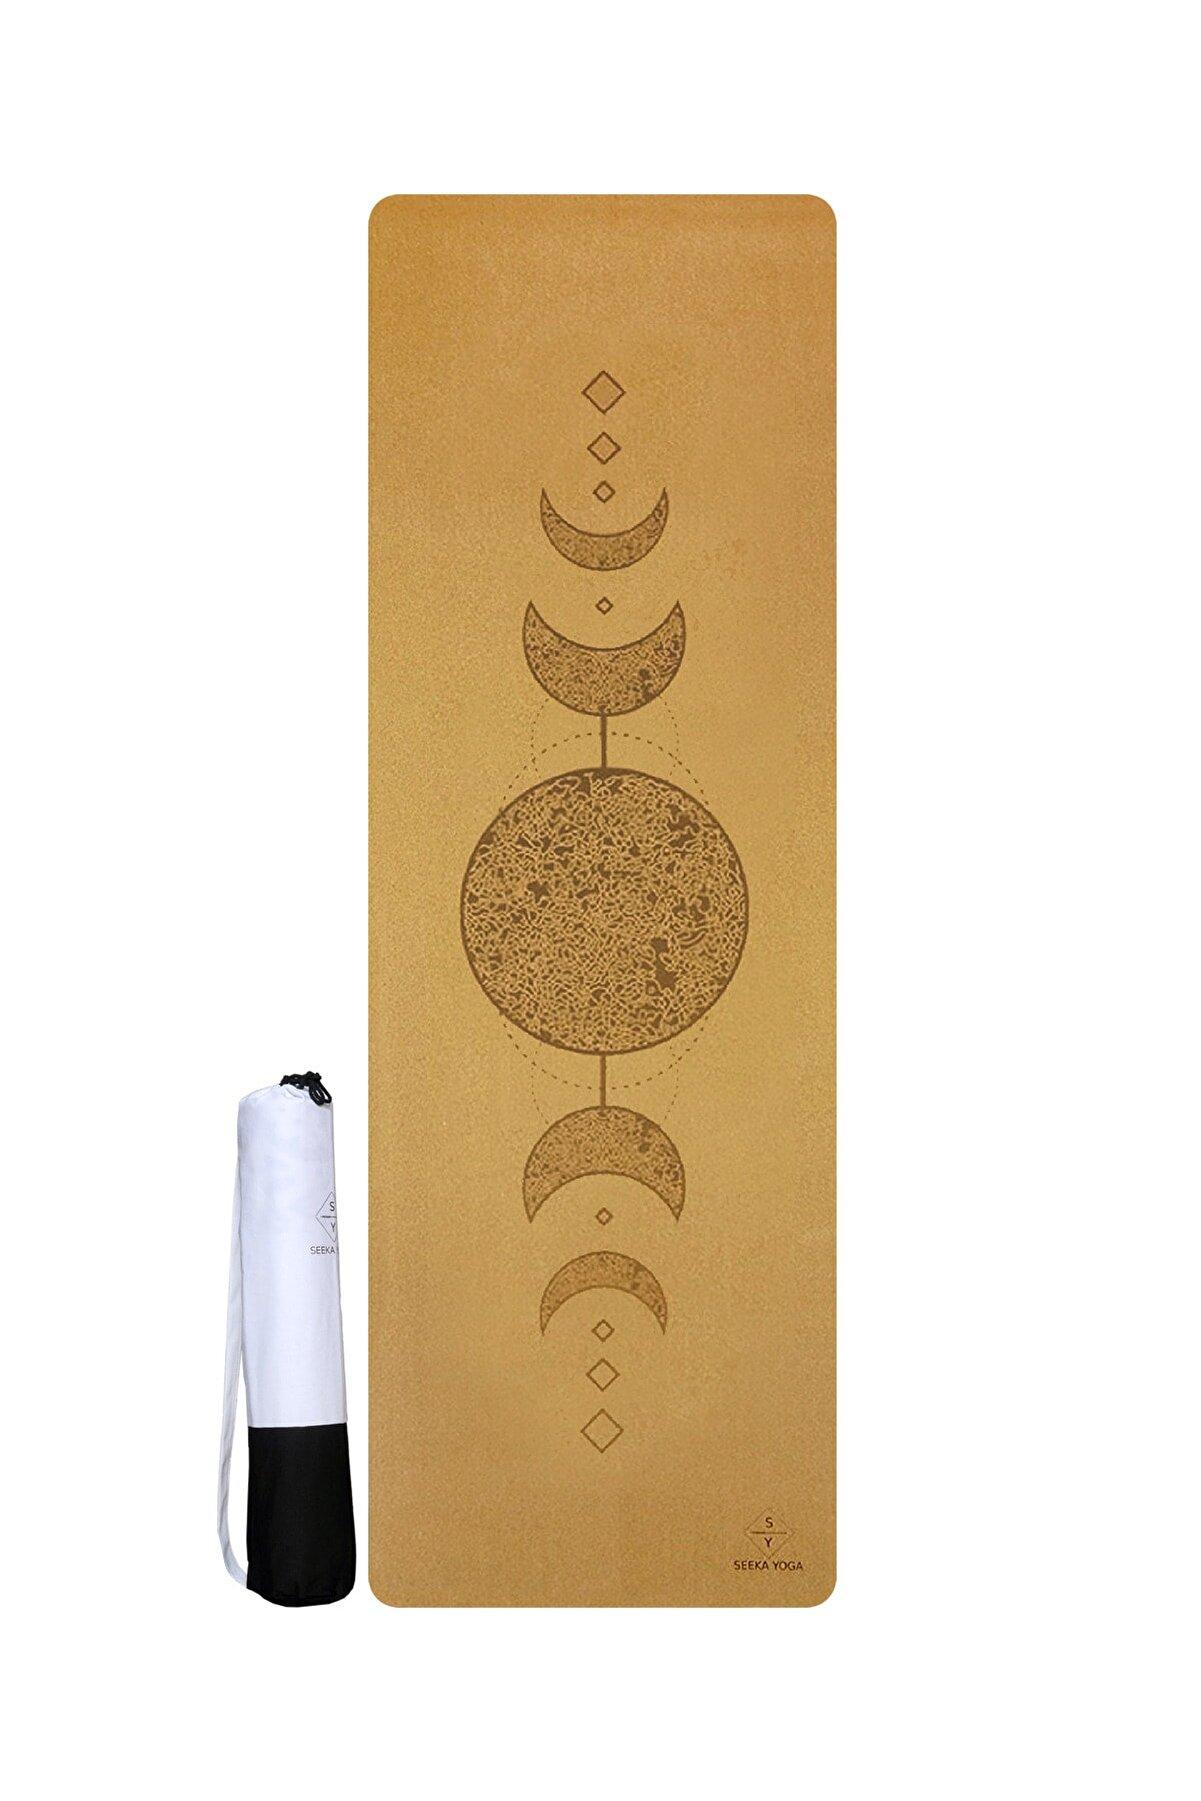 Seeka Yoga Moon Mantar Yüzeyli Doğal Kauçuk Yoga Matı